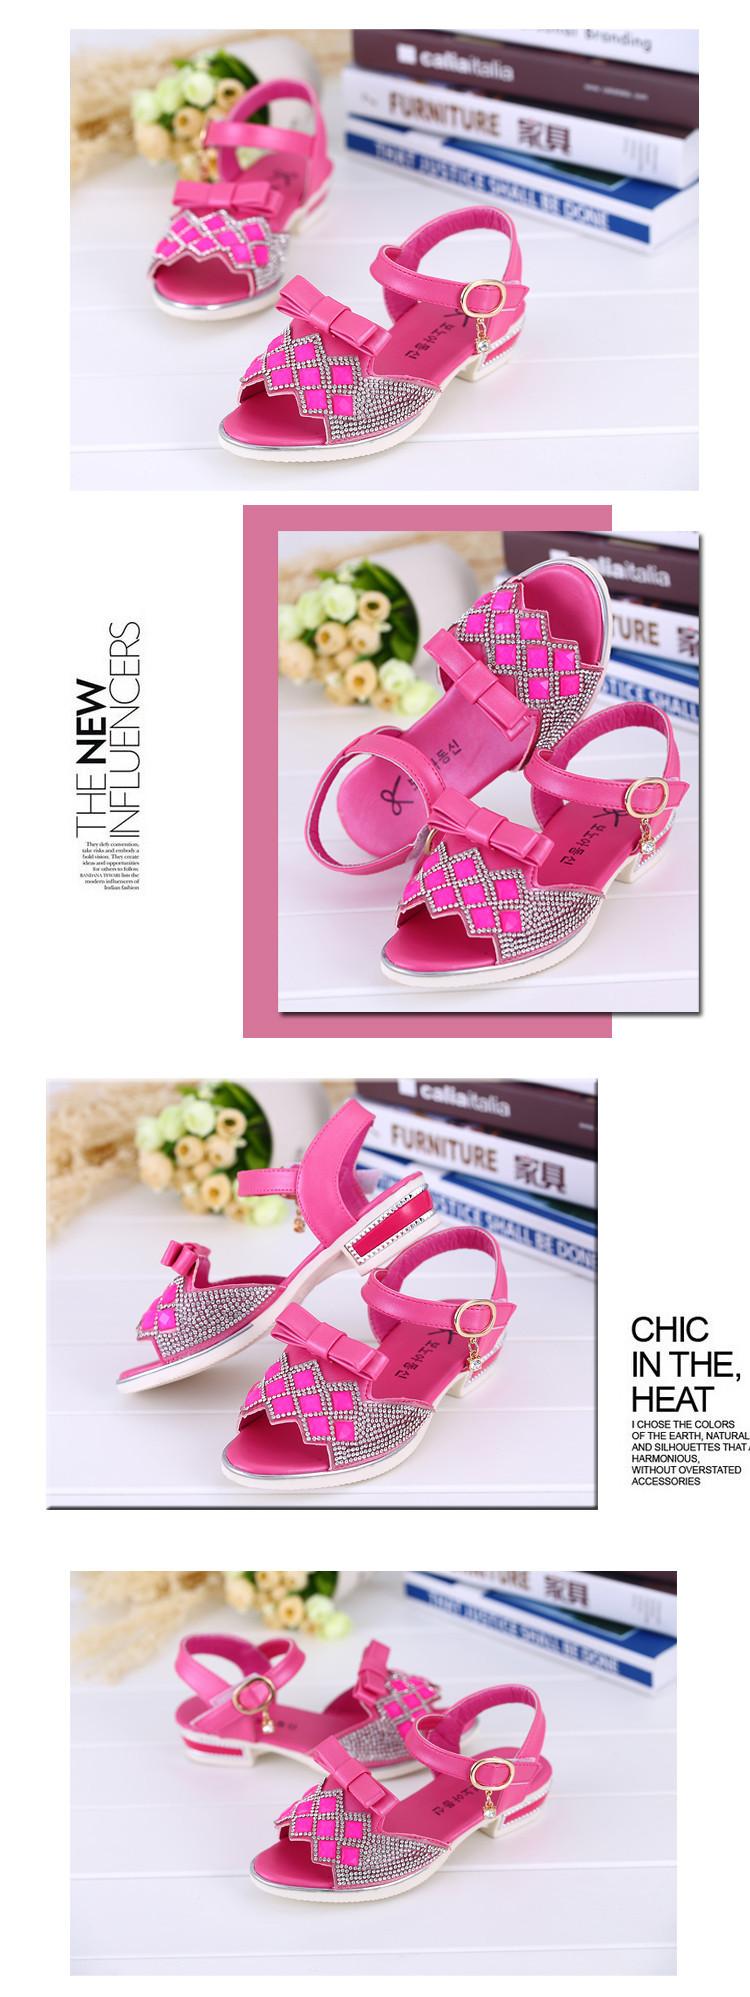 Мода горный хрусталь детская обувь детская обувь девочек боути сандалии meninas sandalias 3 цвет размер 32 - 37